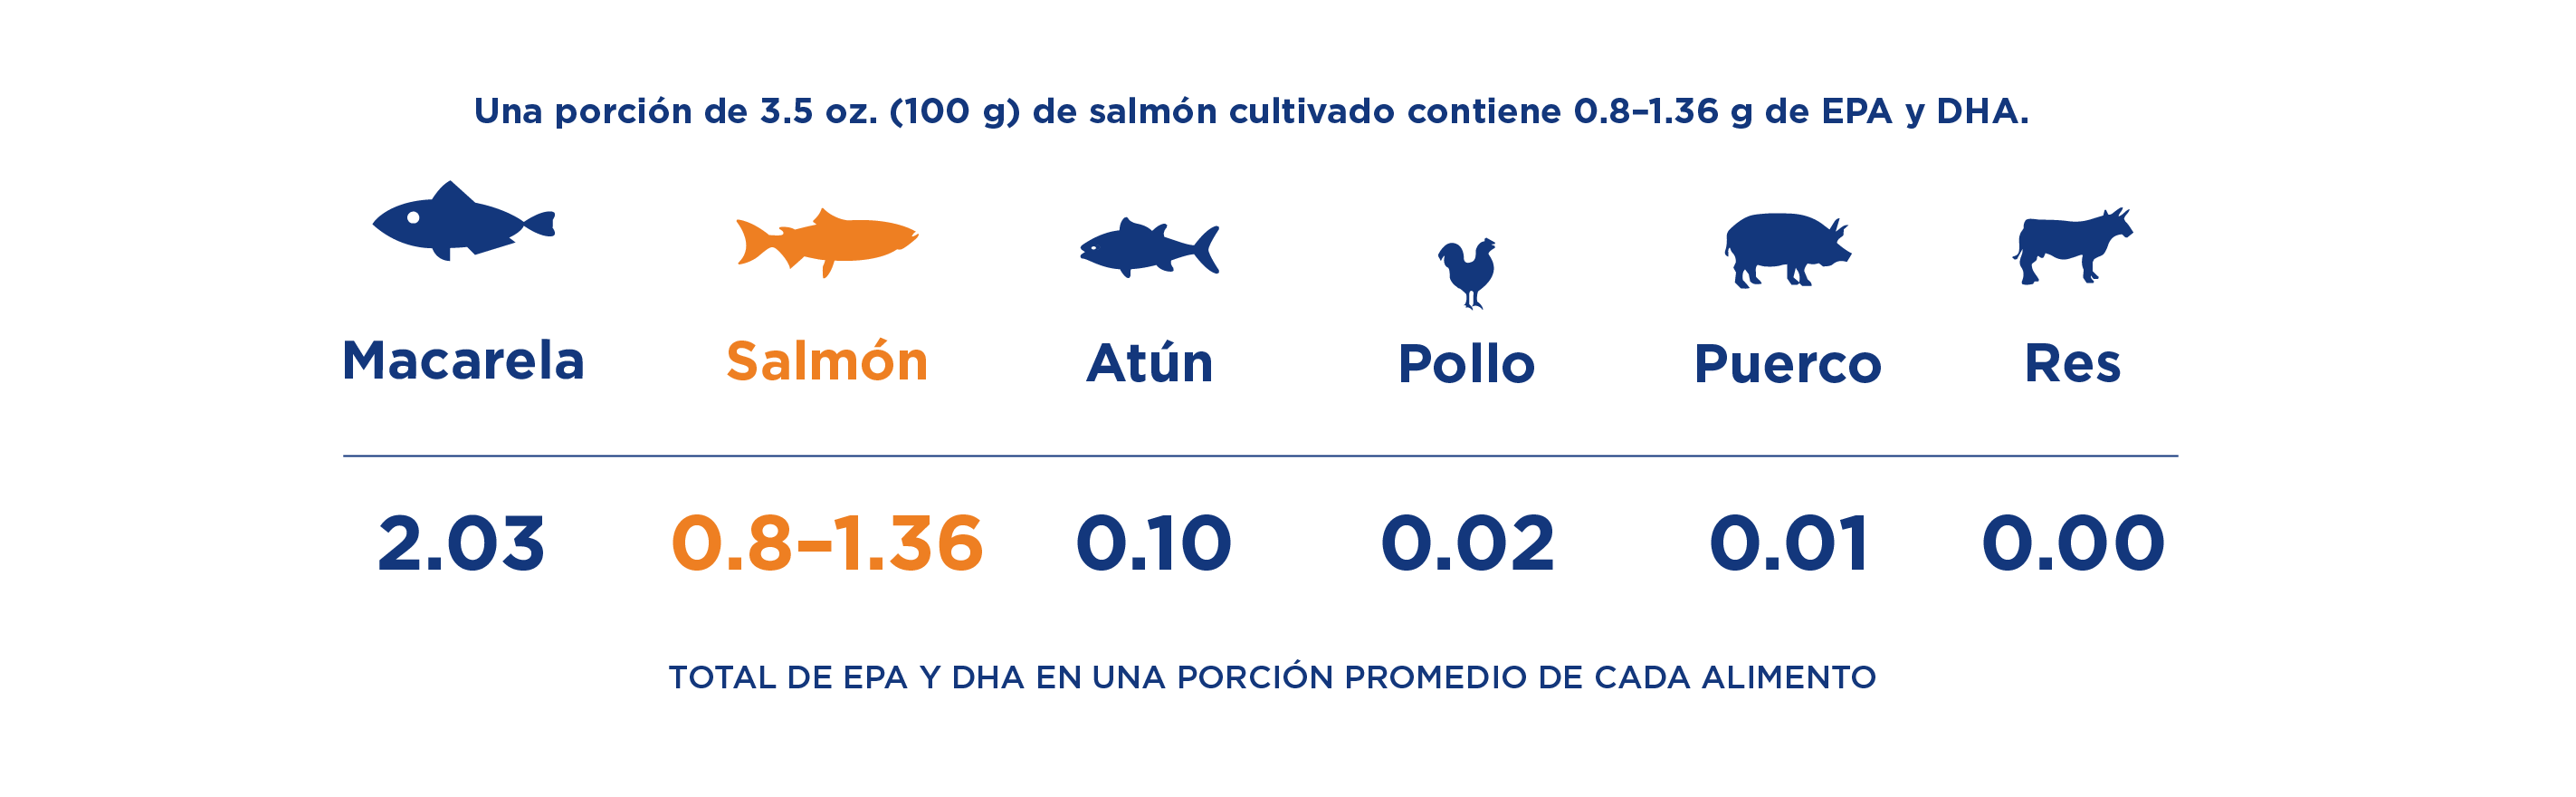 OMEGA3_Graph_Jul14-2020_SPANISH-01.png#asset:5836